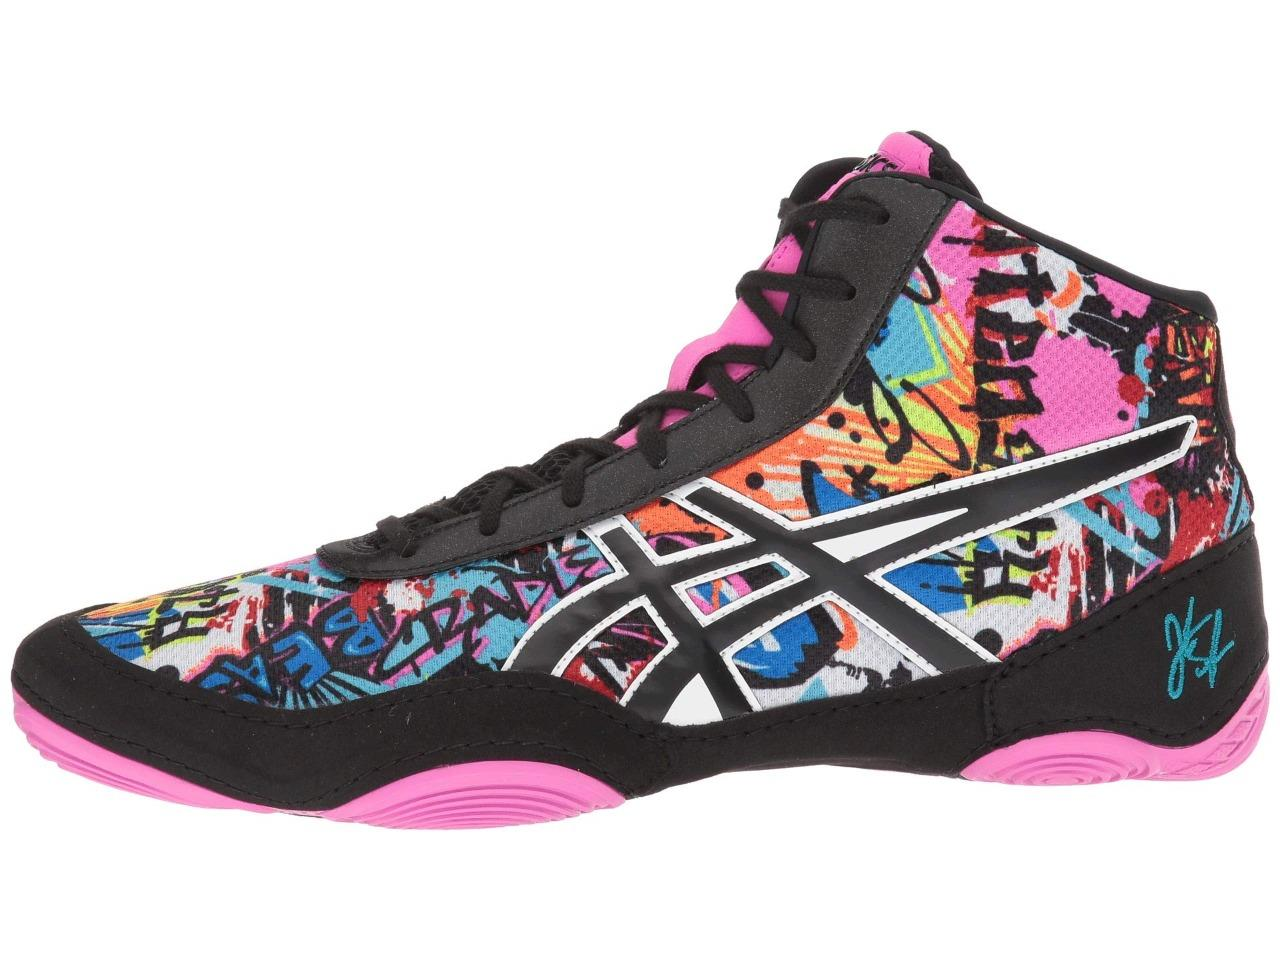 Details about Asics JB Elite V2.0 Wrestling Shoes Men's Size 8 12 Cosmic Graffiti J501Q Last 1